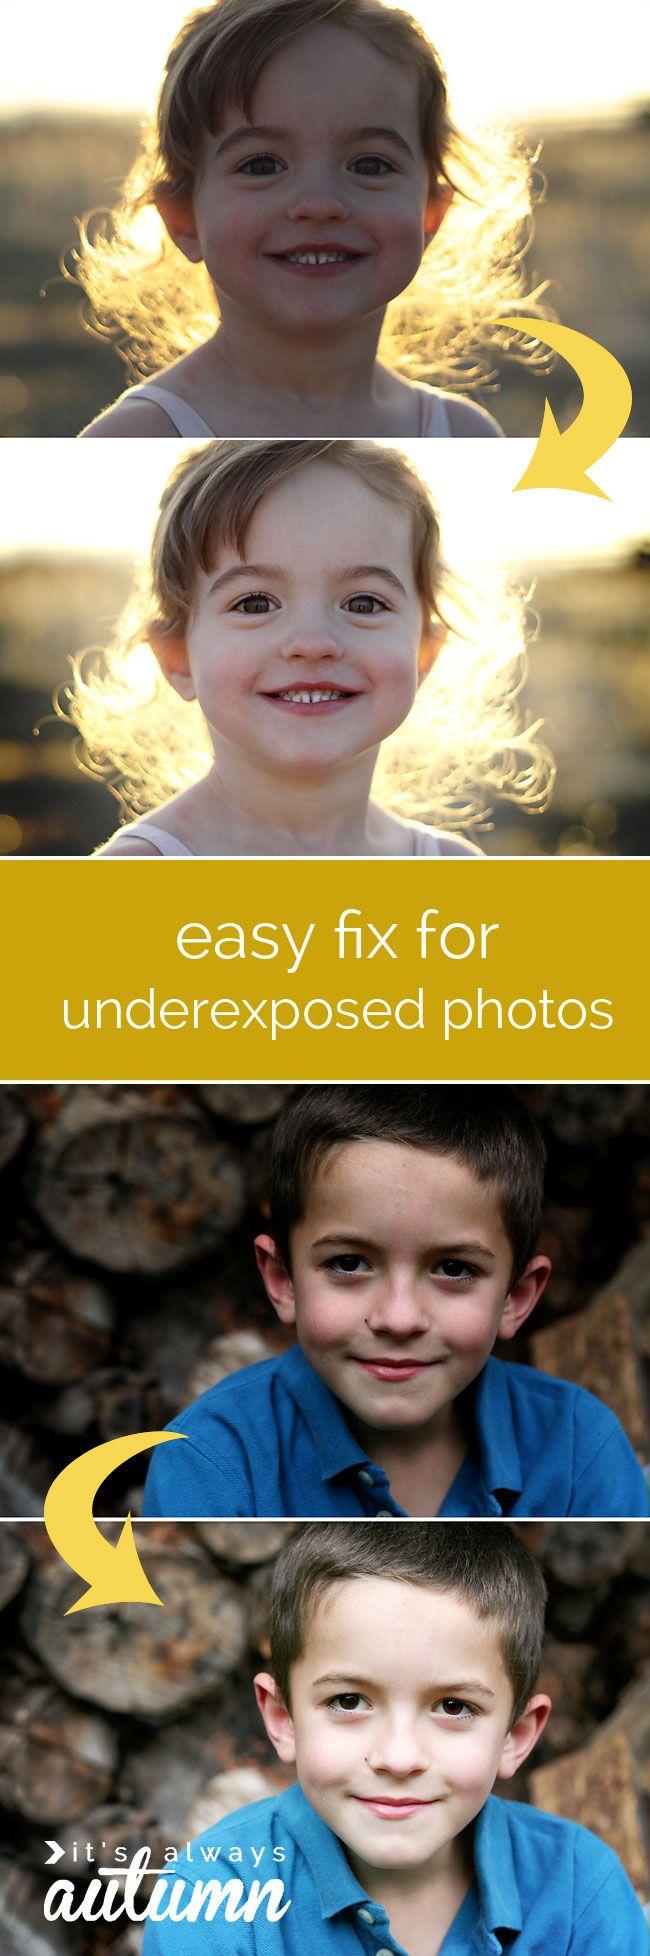 easy fix for dark or underexposed photos   simple photo edit – It's Always Autumn